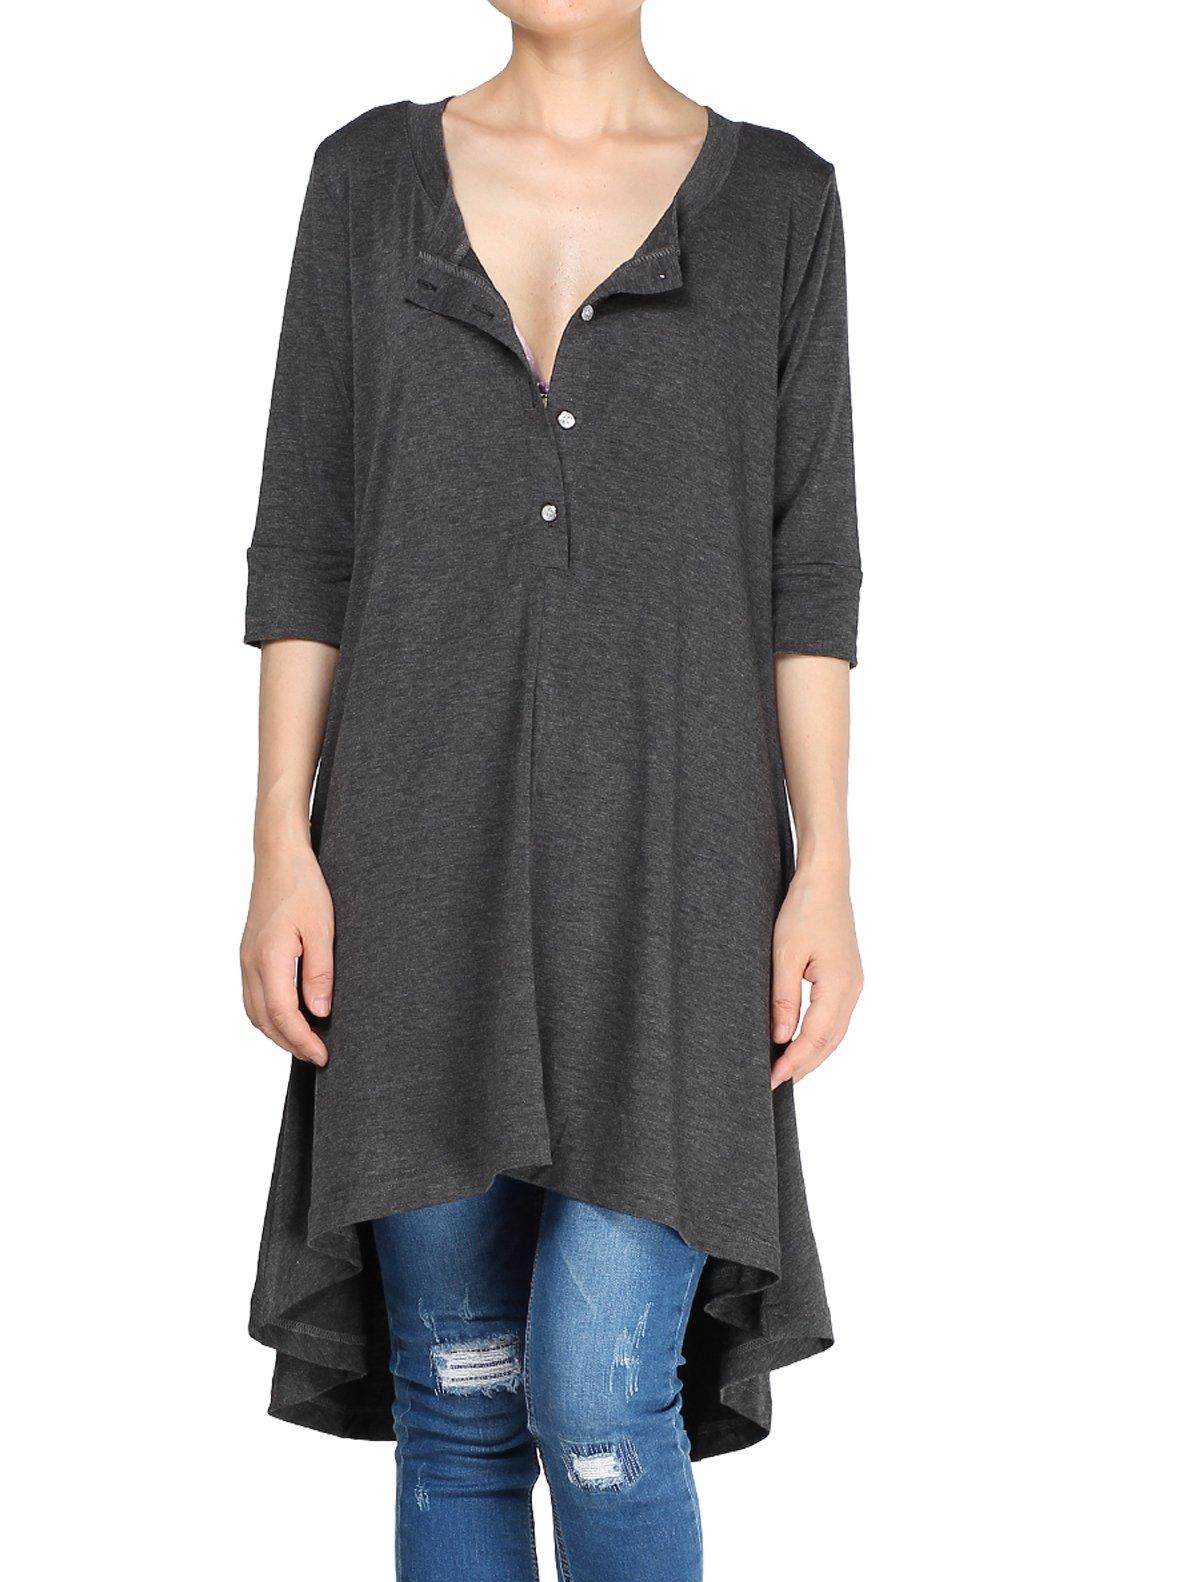 Mordenmiss Women's New Half Sleeve High Low Loose Tunic Tops Dark Gray-XXL